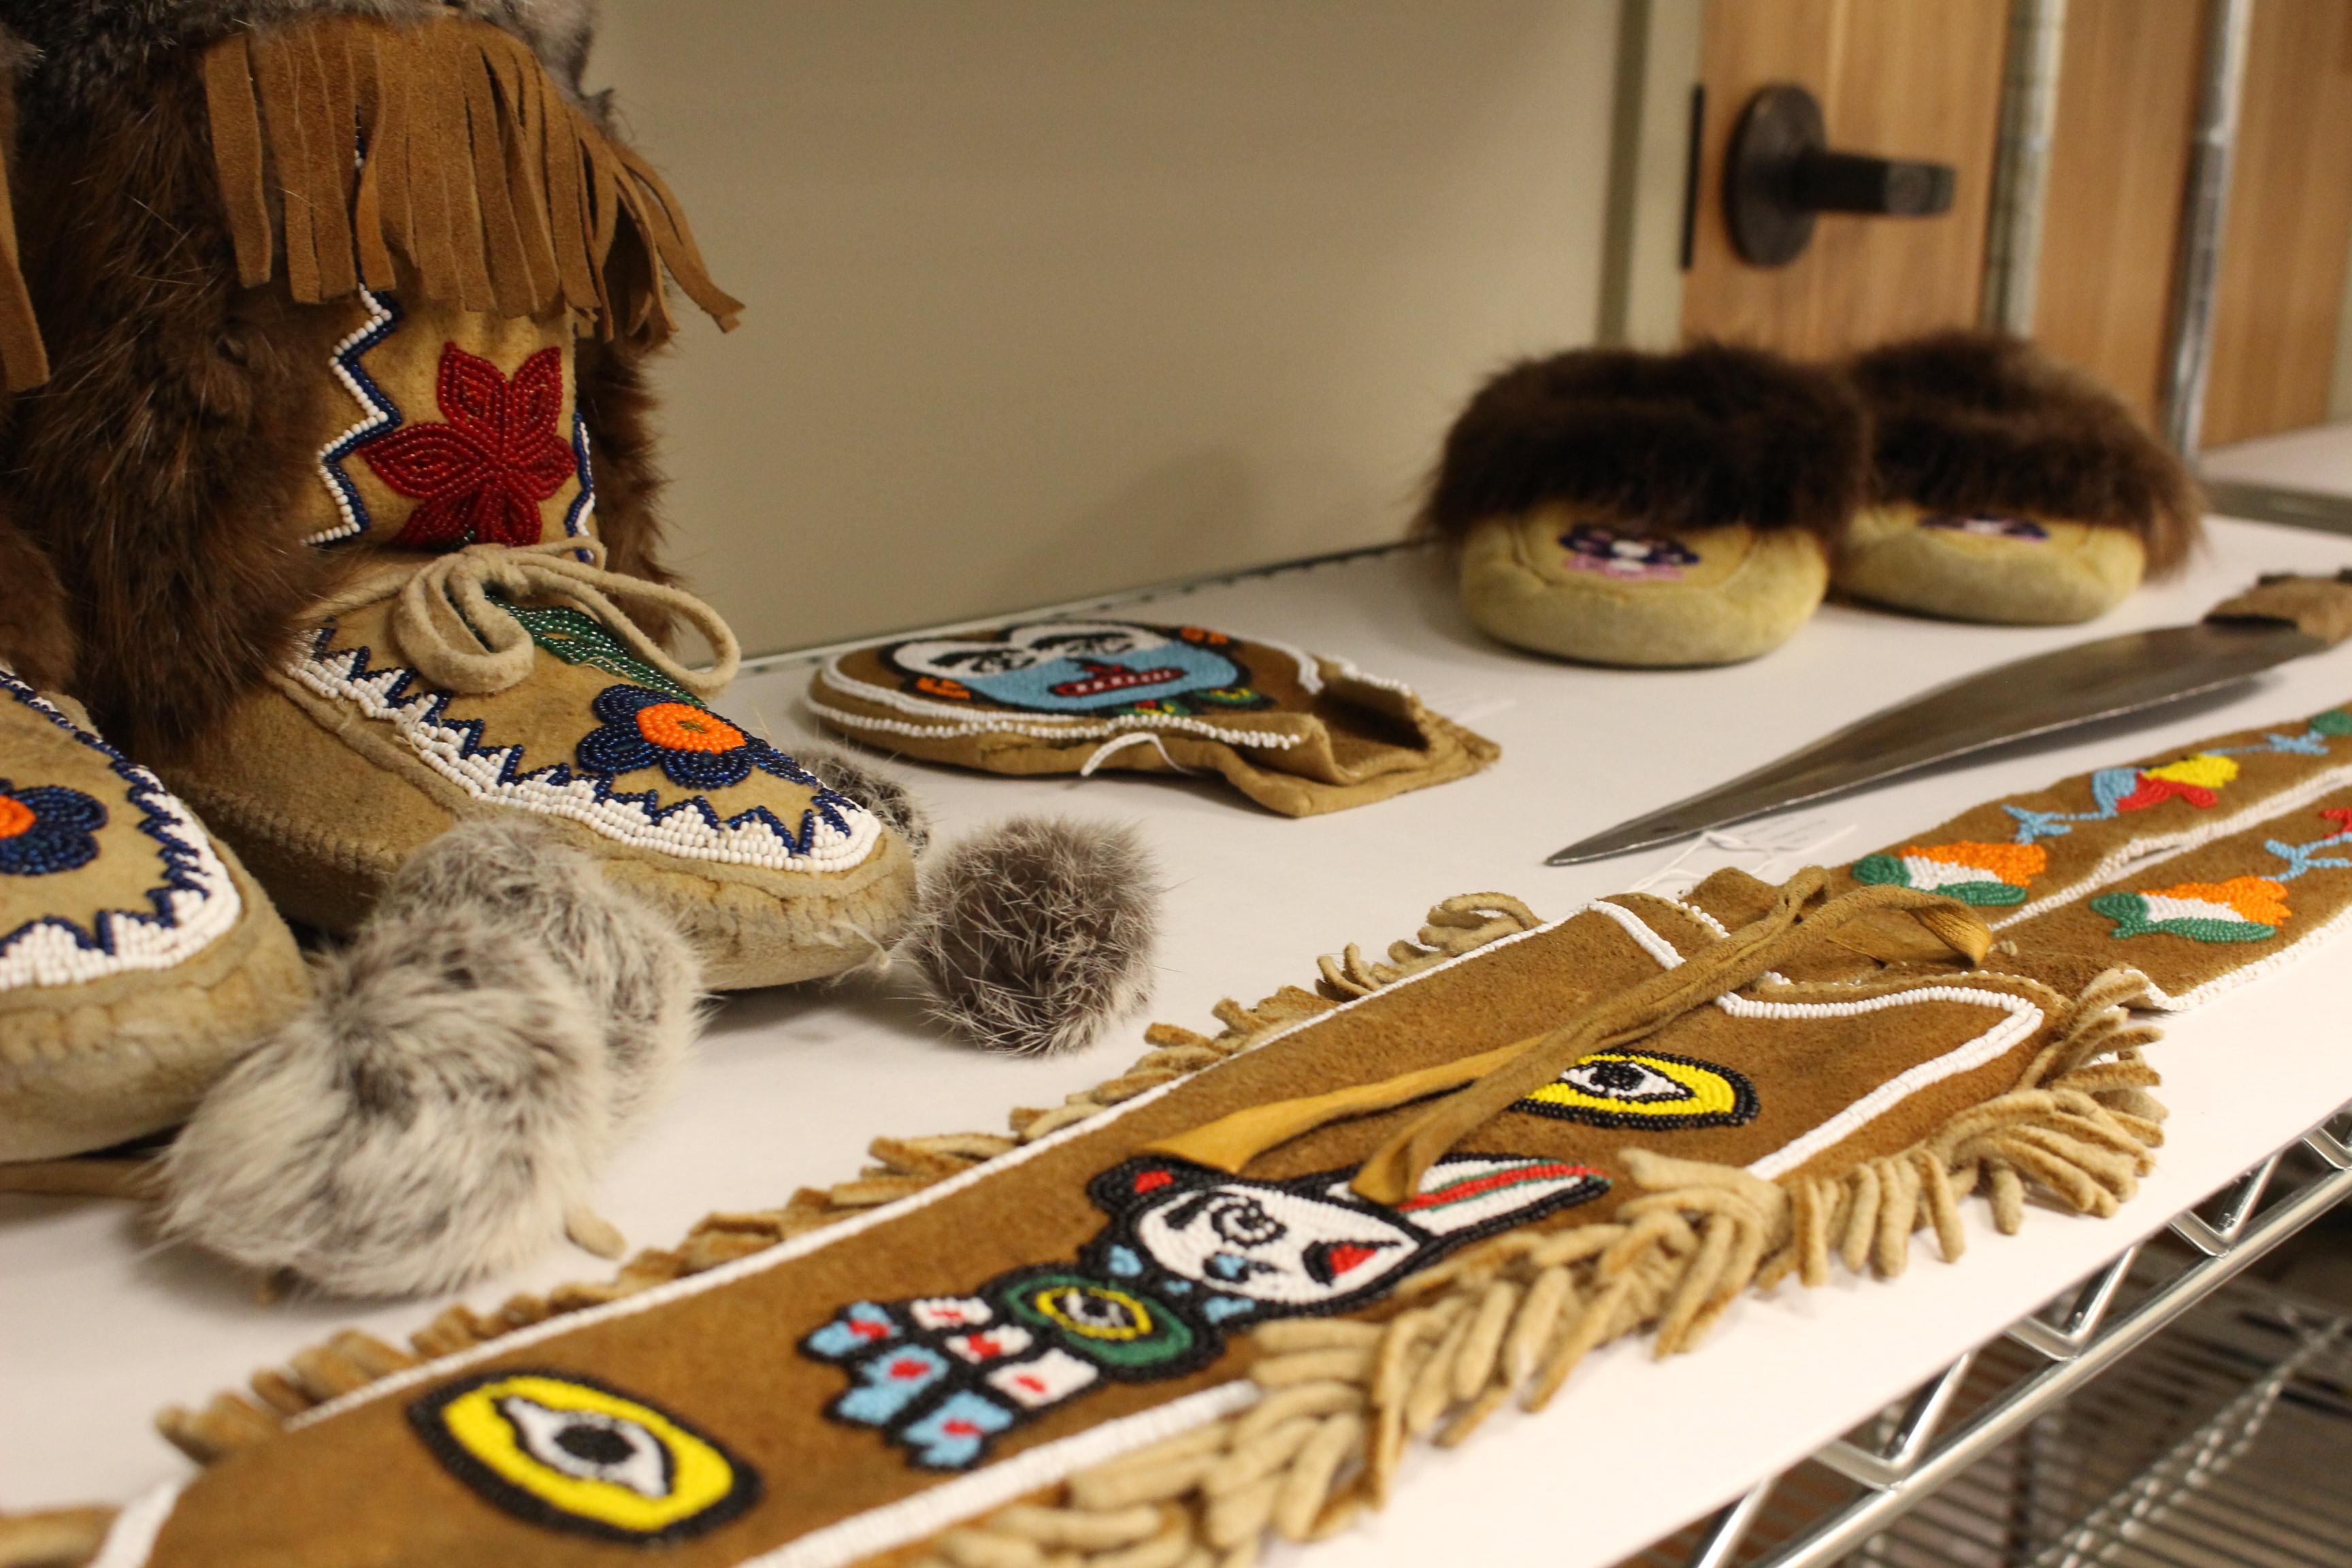 Items in storage at Sealaska Heritage Institute. (Photo by Elizabeth Jenkins/KTOO)